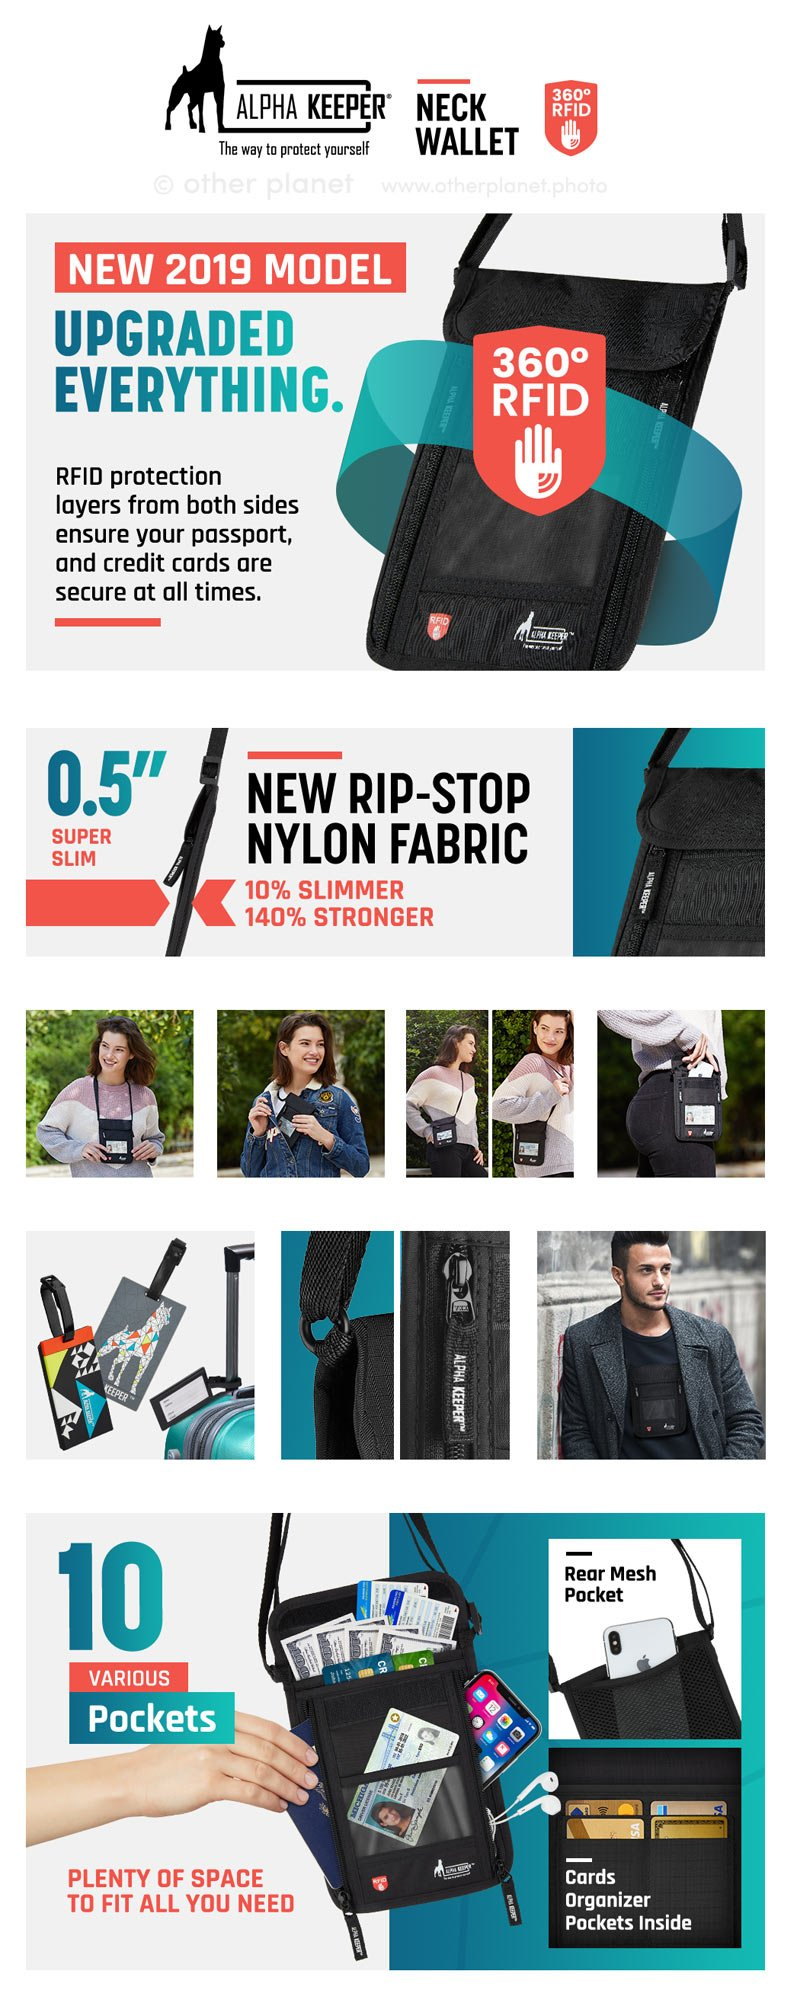 amazon fba product photography for neck wallet EBC